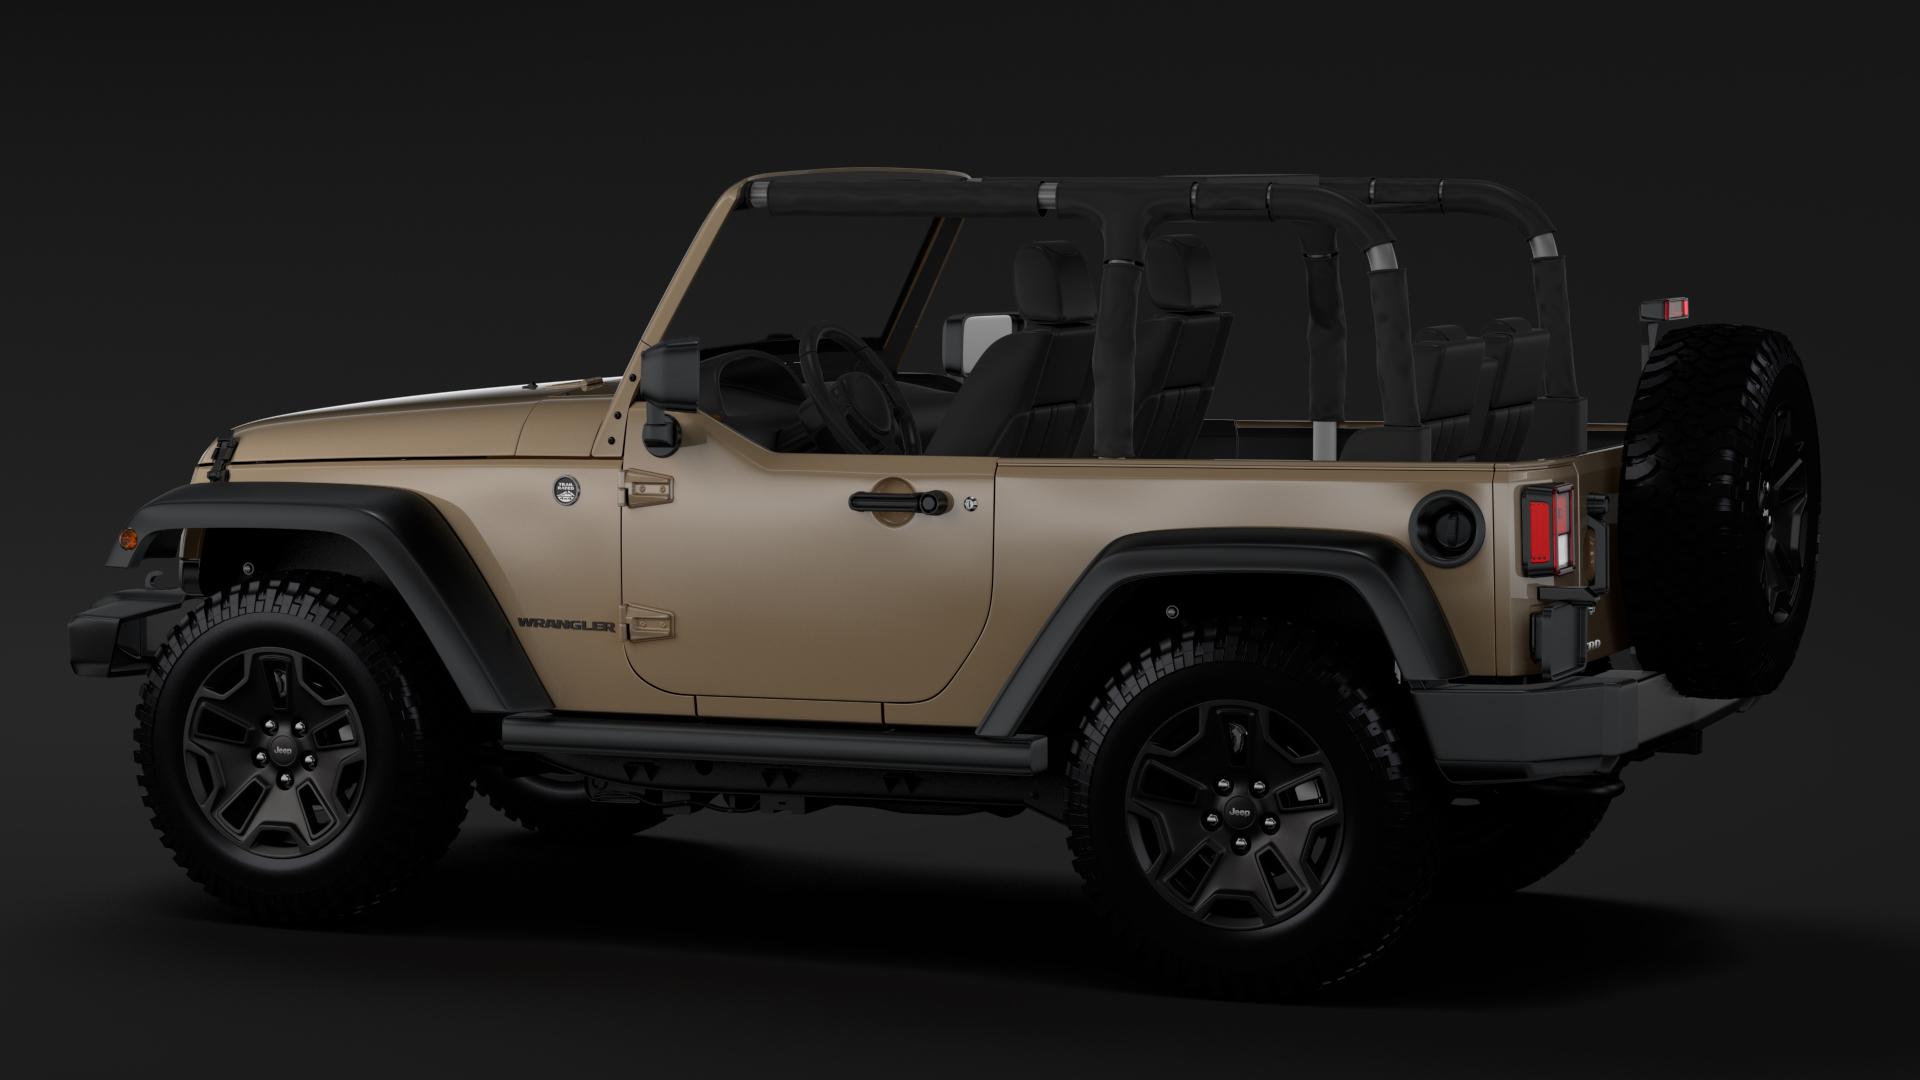 jeep wrangler willys wheeler jk 2017 3d model max fbx c4d lwo ma mb hrc xsi obj 276804